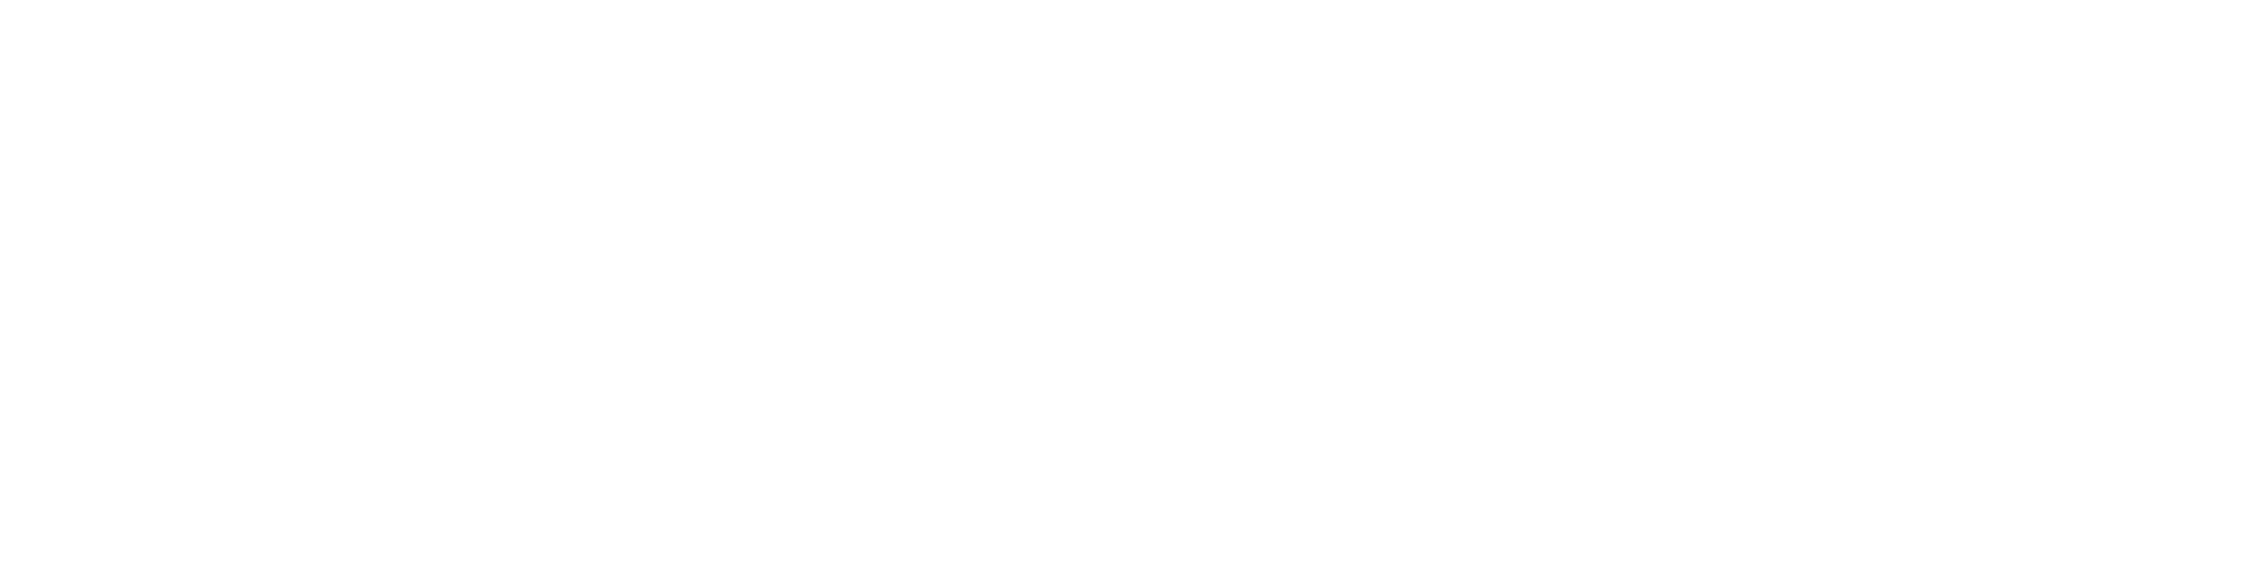 ACPA_Logo-Condensed-White